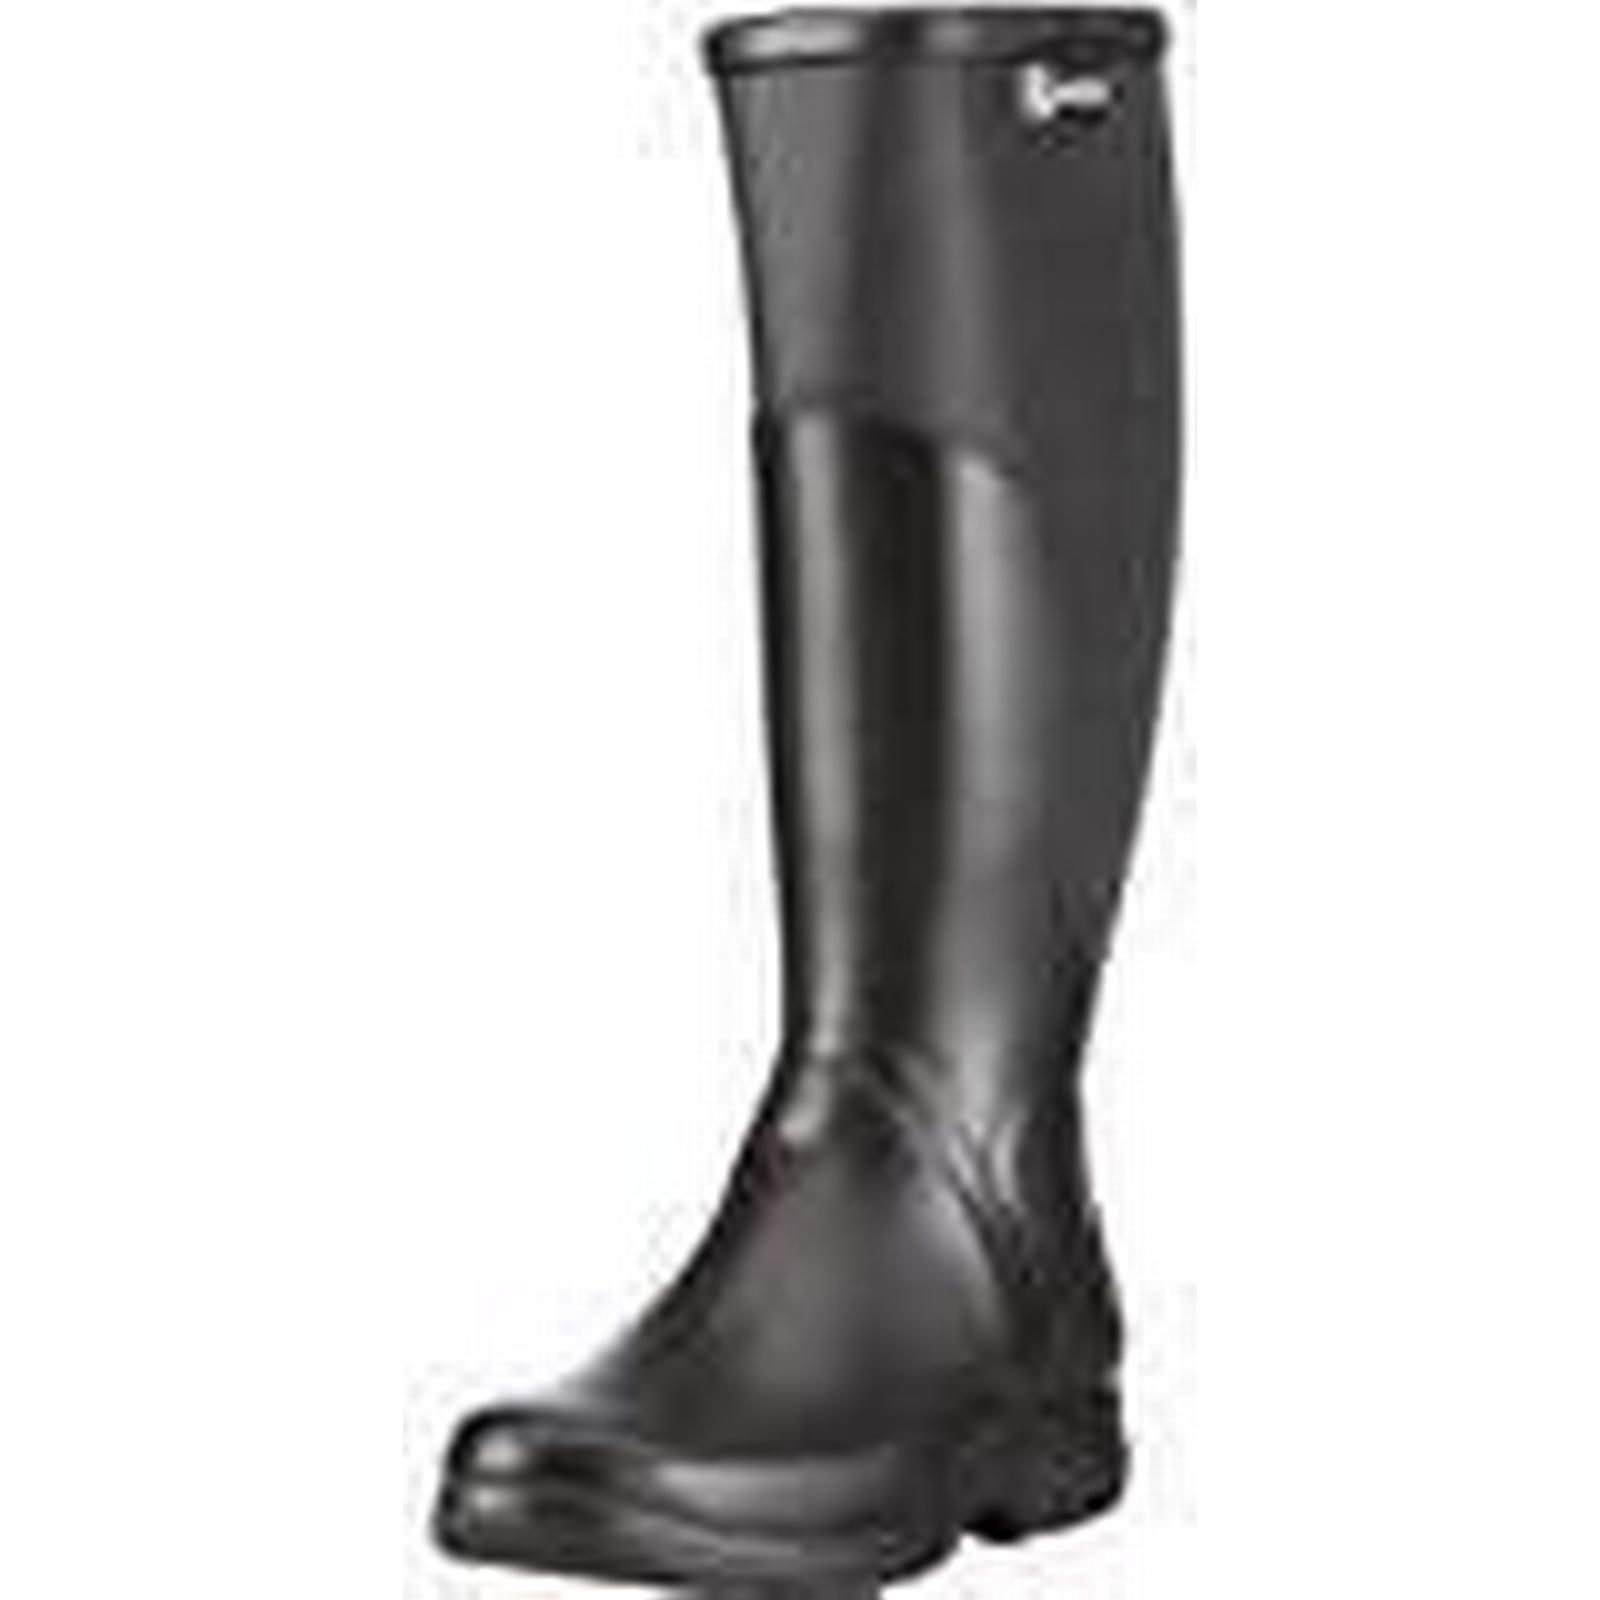 Aigle Unisex Adults' Rboot 6.5 Wellington Boots, Black (Black), 6.5 Rboot UK 4d30a9